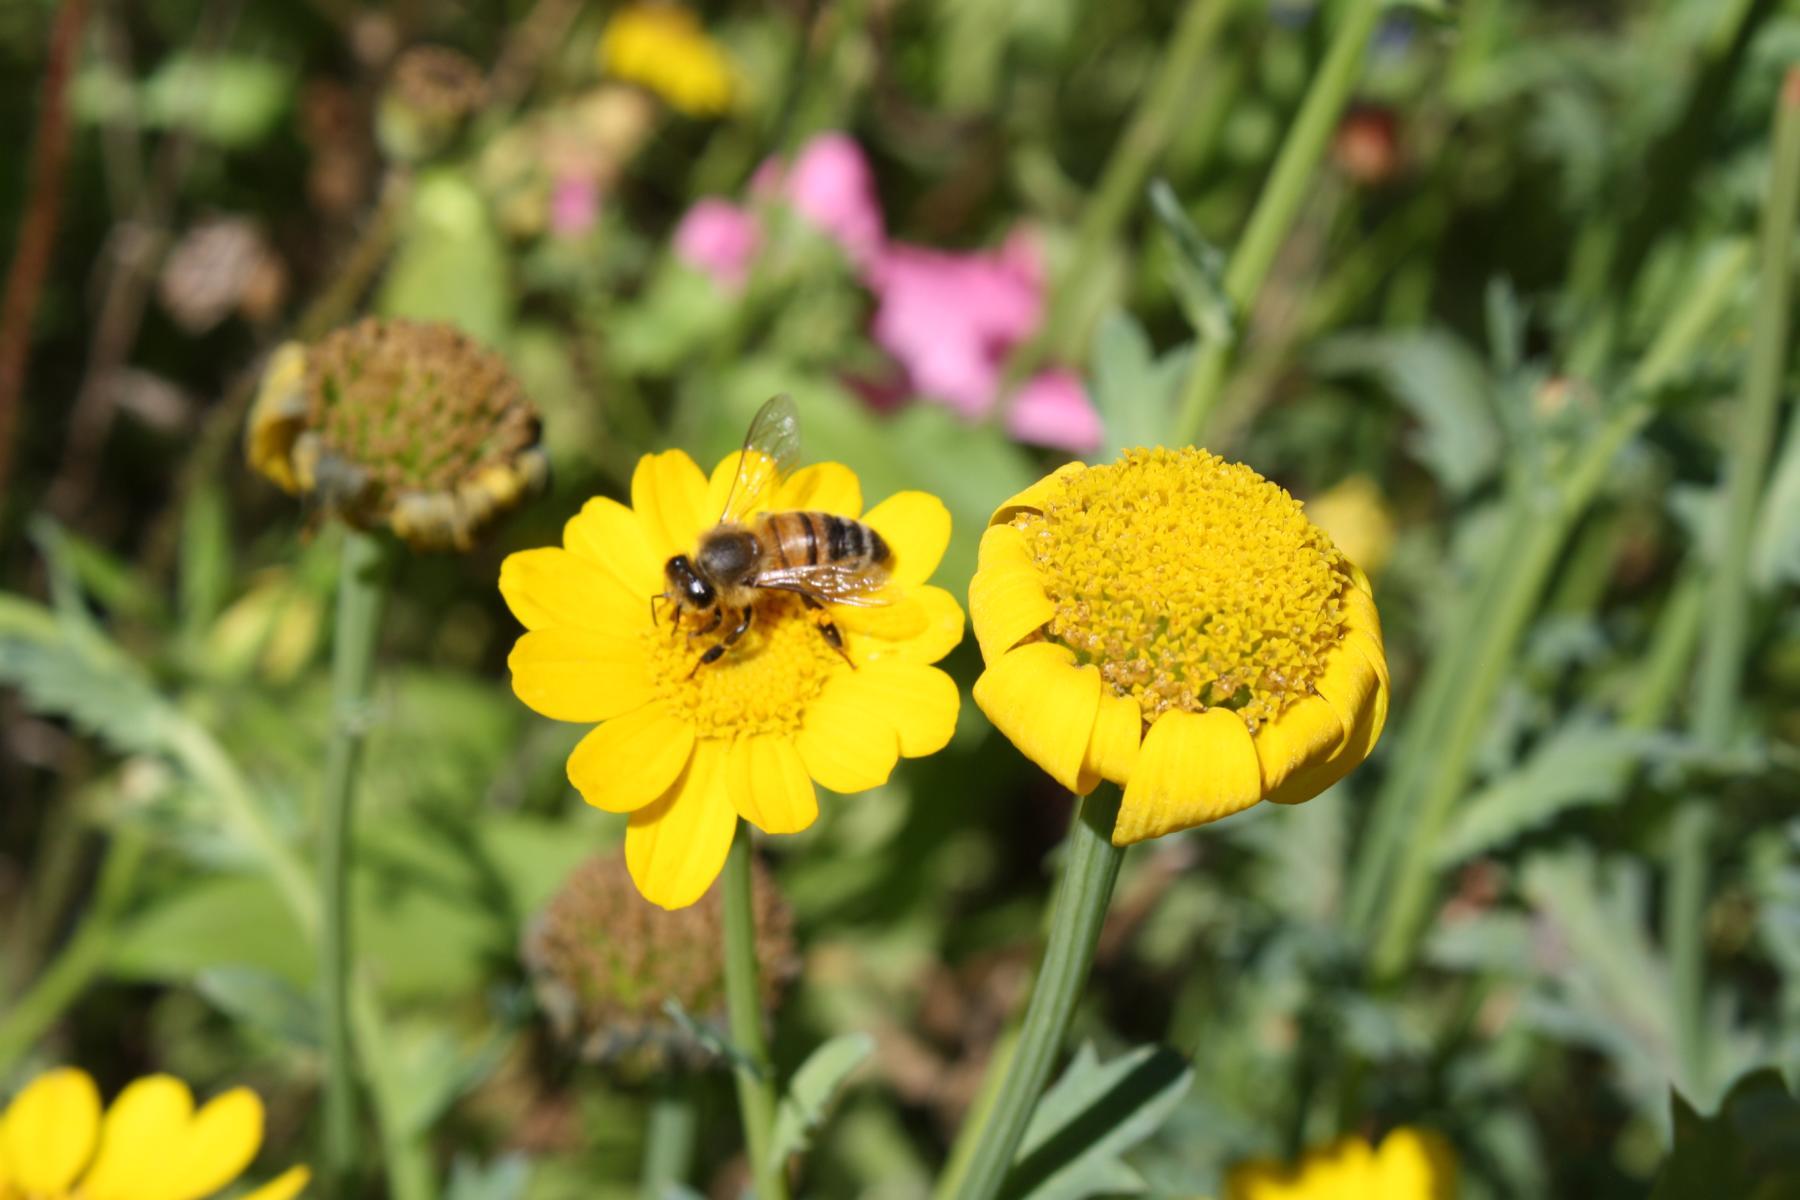 Honigwabe Wabe Flecke Saaten Handel Honig Bienen Bienenvolk Bienenstock Blumenwiesenmischung Mischung Wildblumen